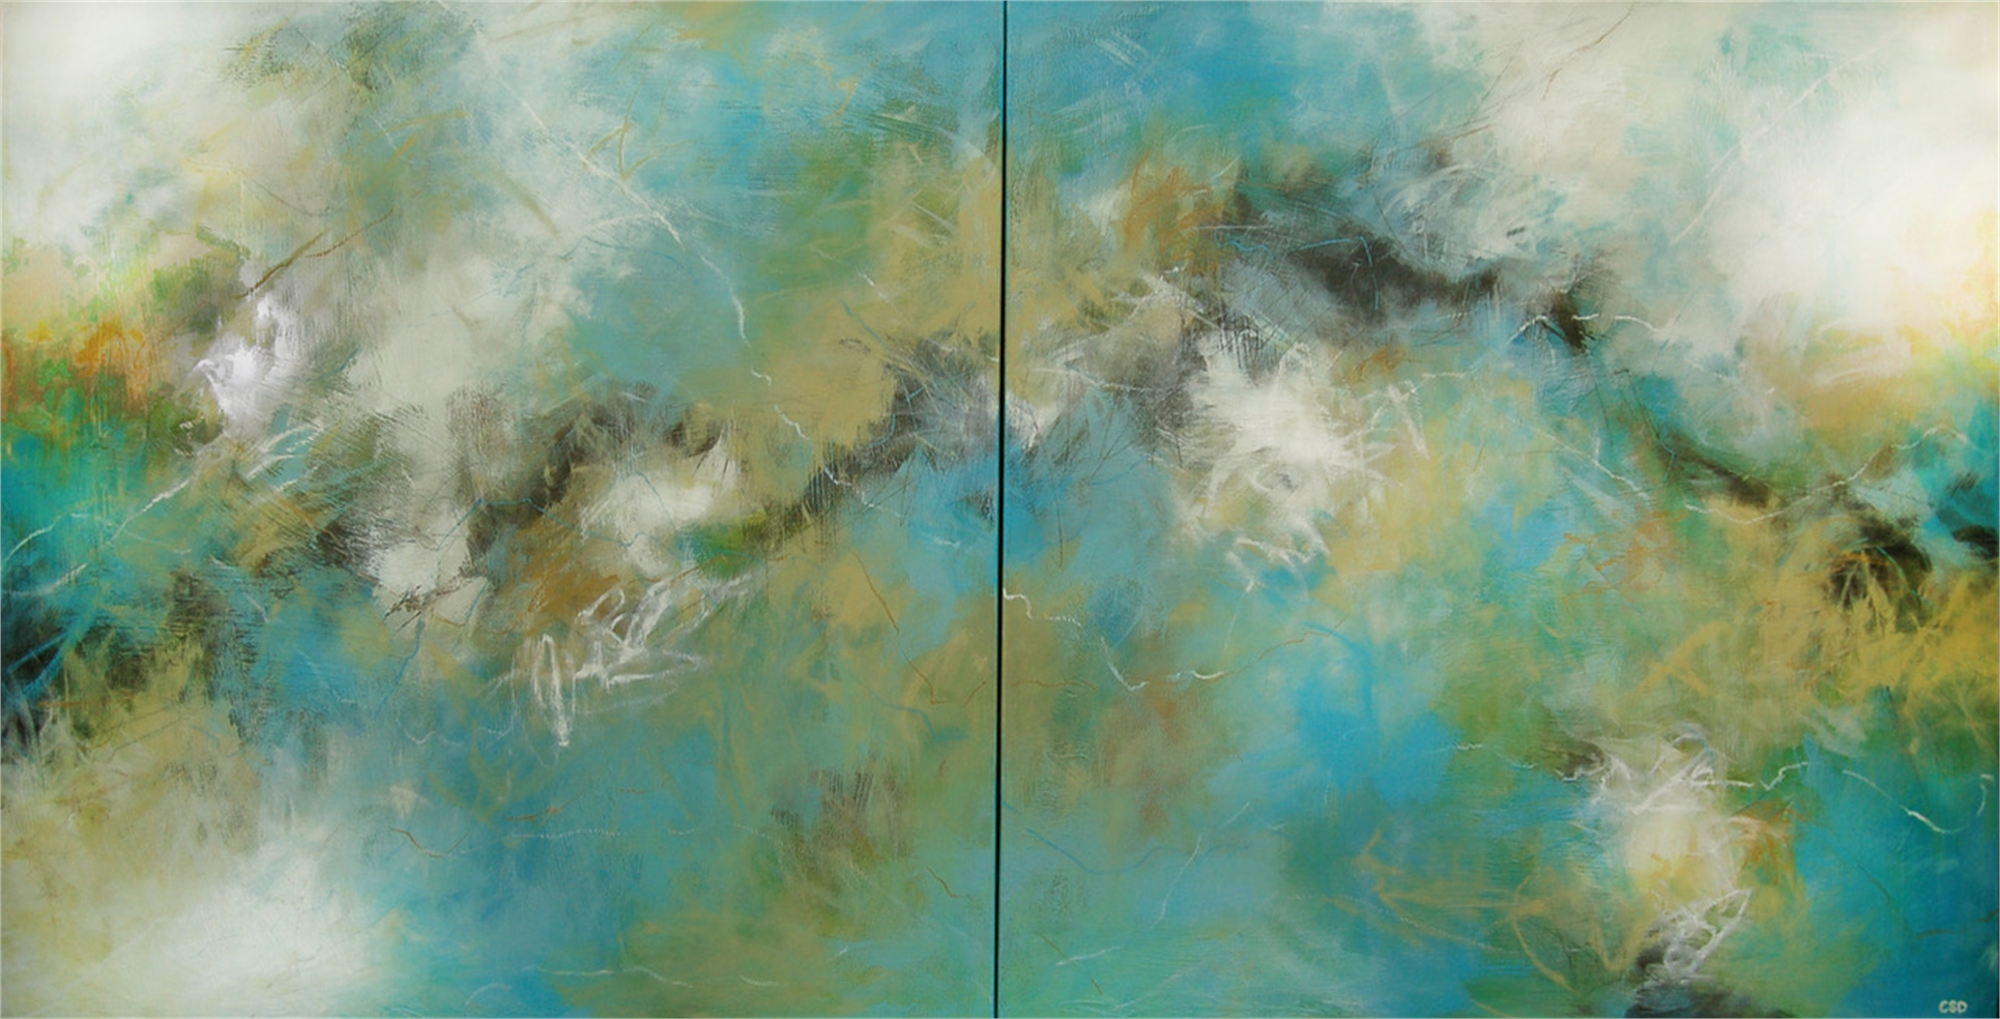 Bora Bora by Christina Doelling